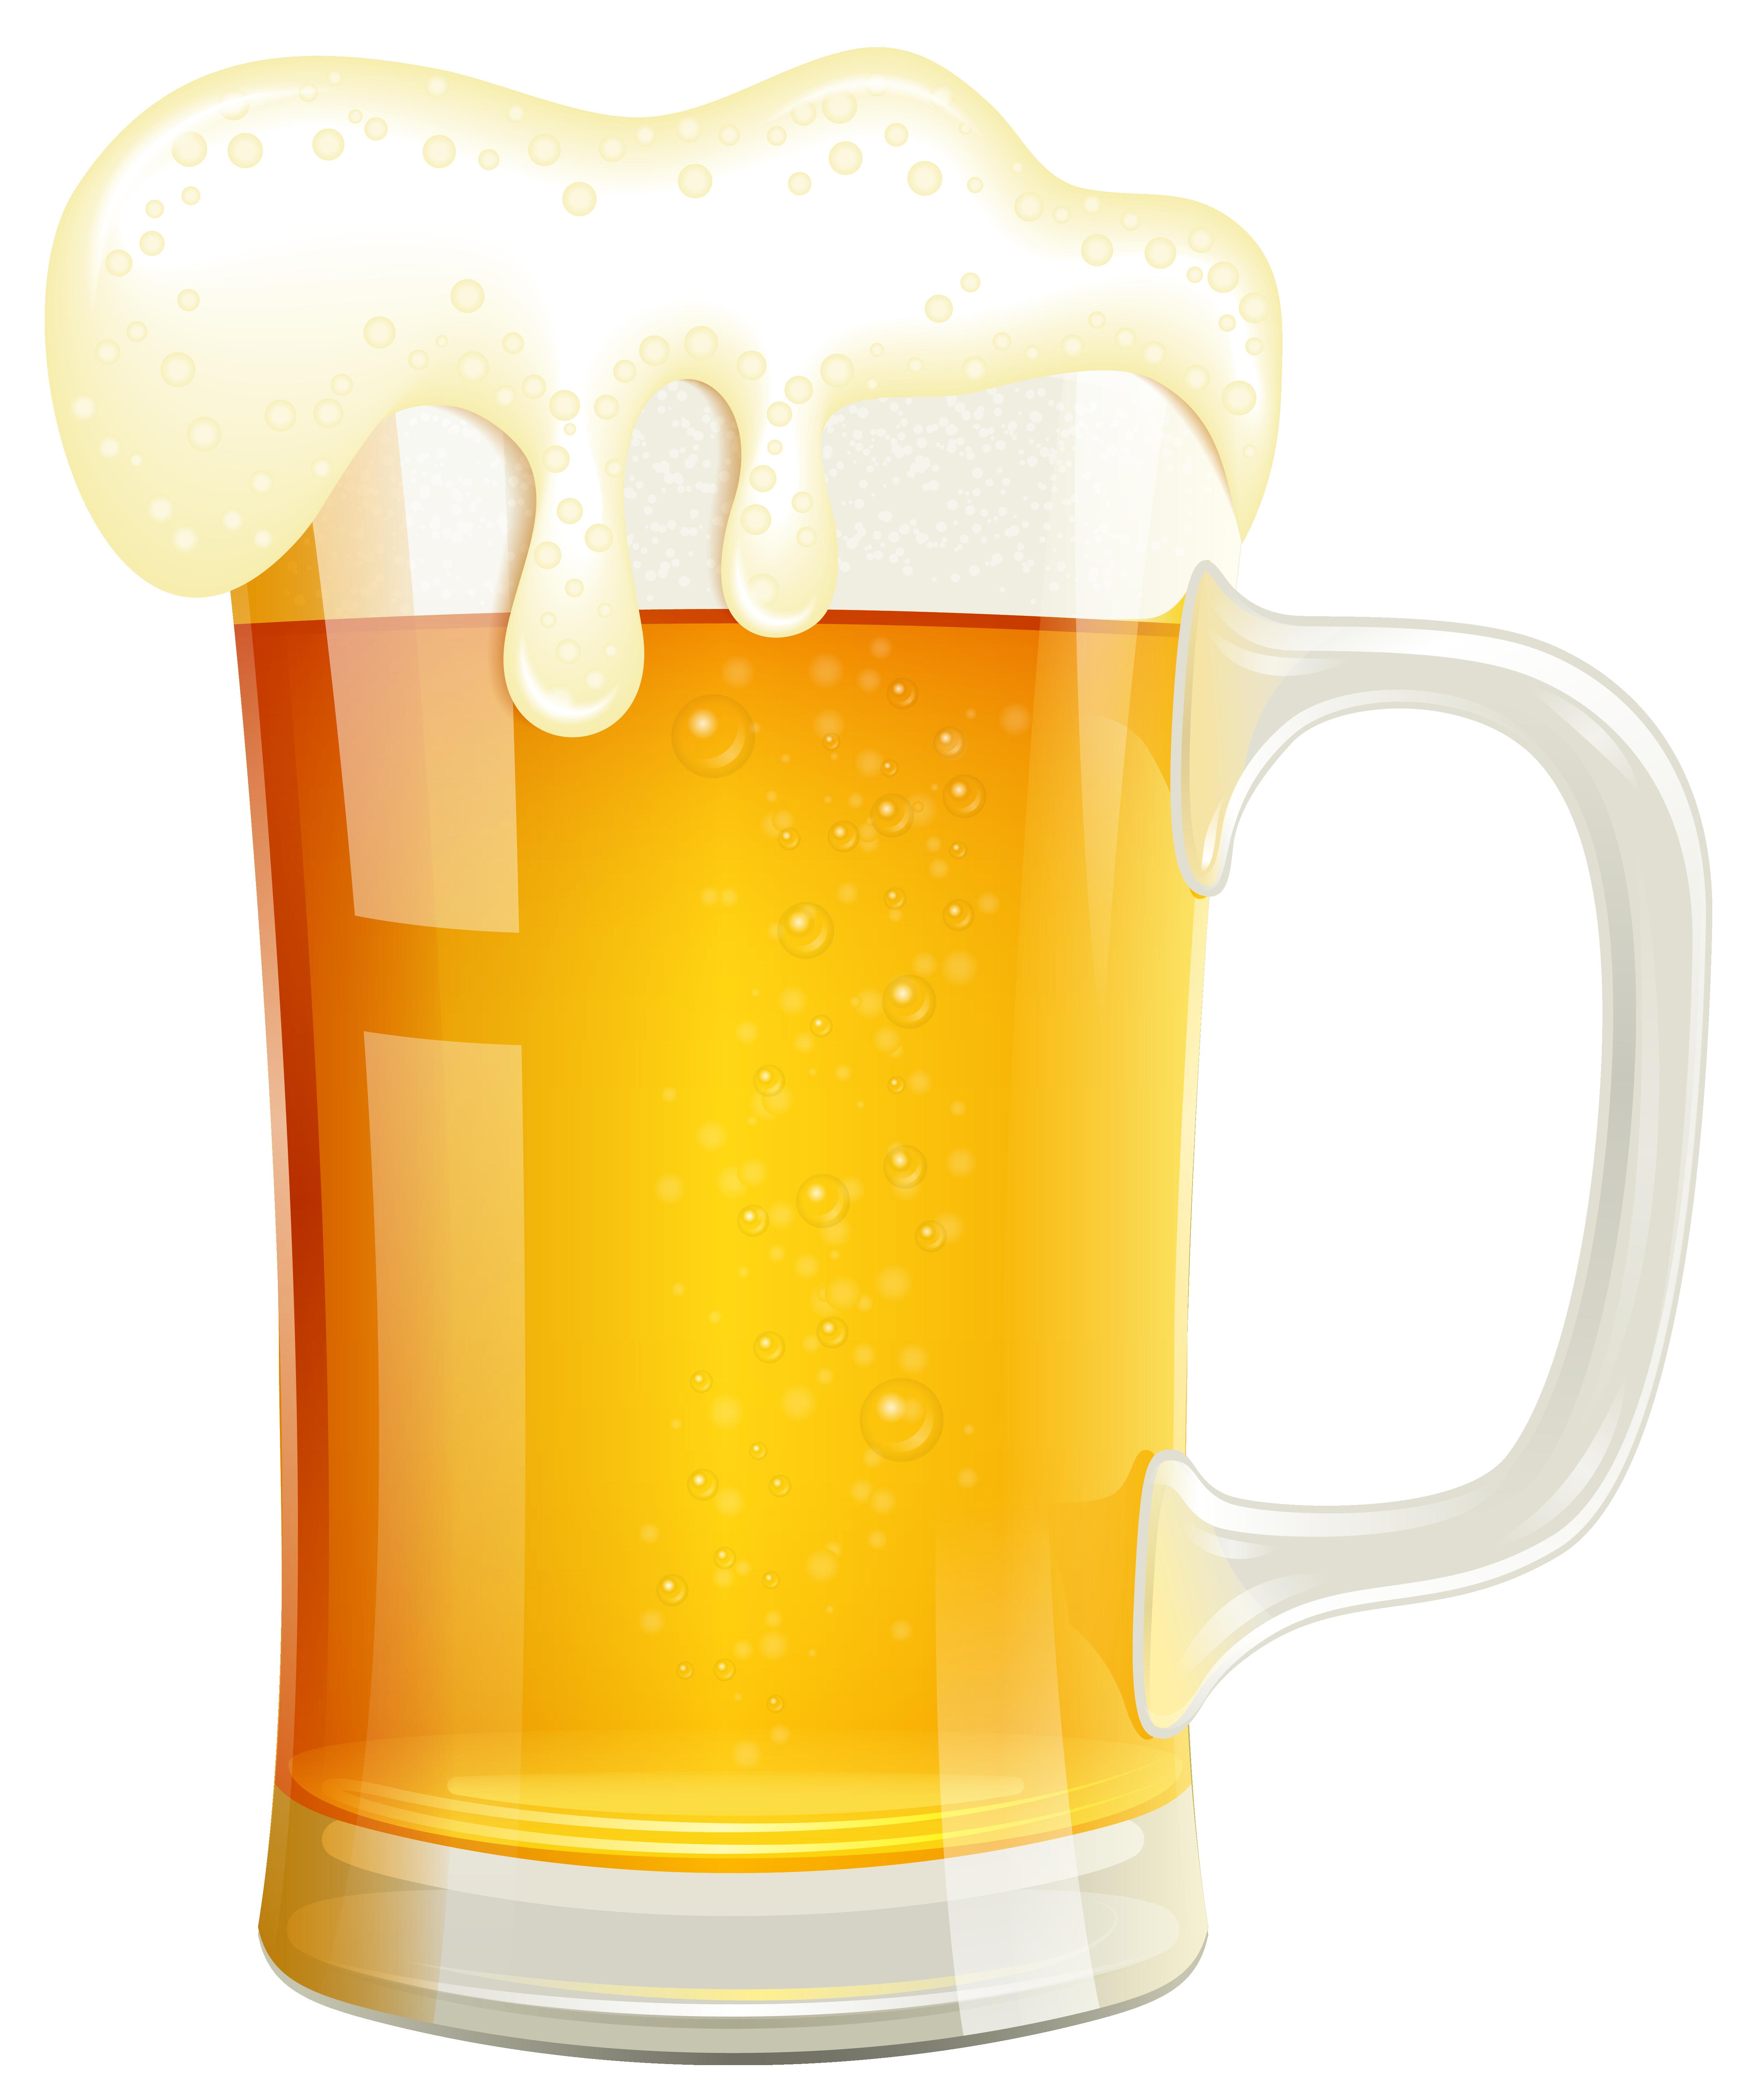 Beer Mug Png Vector Clipart Imag Beer Mug Clip Art Mugs